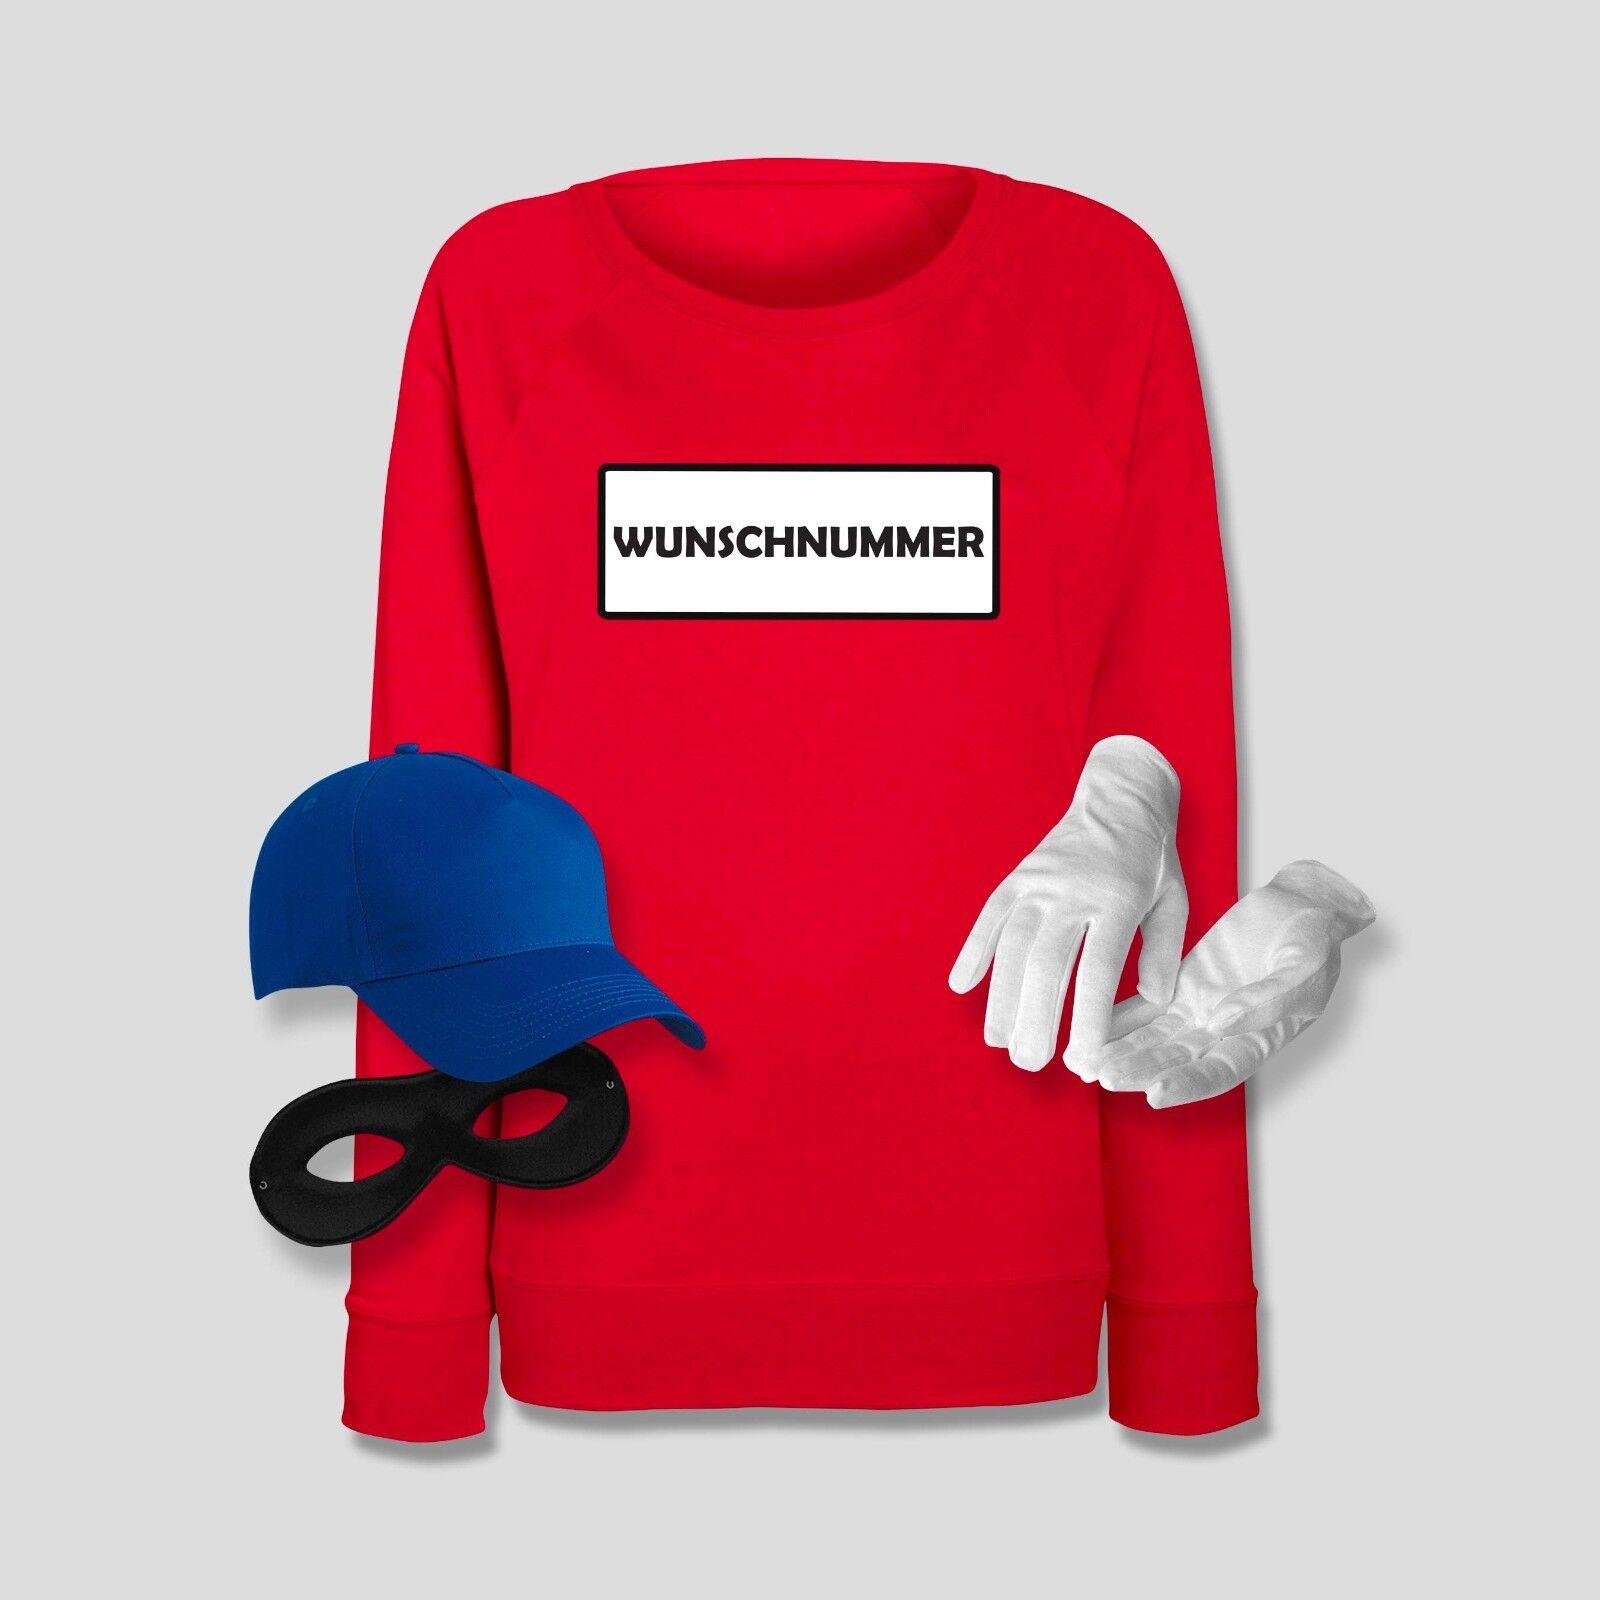 Sweatshirt Kostüm Set Panzerknacker mit Wunschnummer Karneval JGA Damen XS-2XL